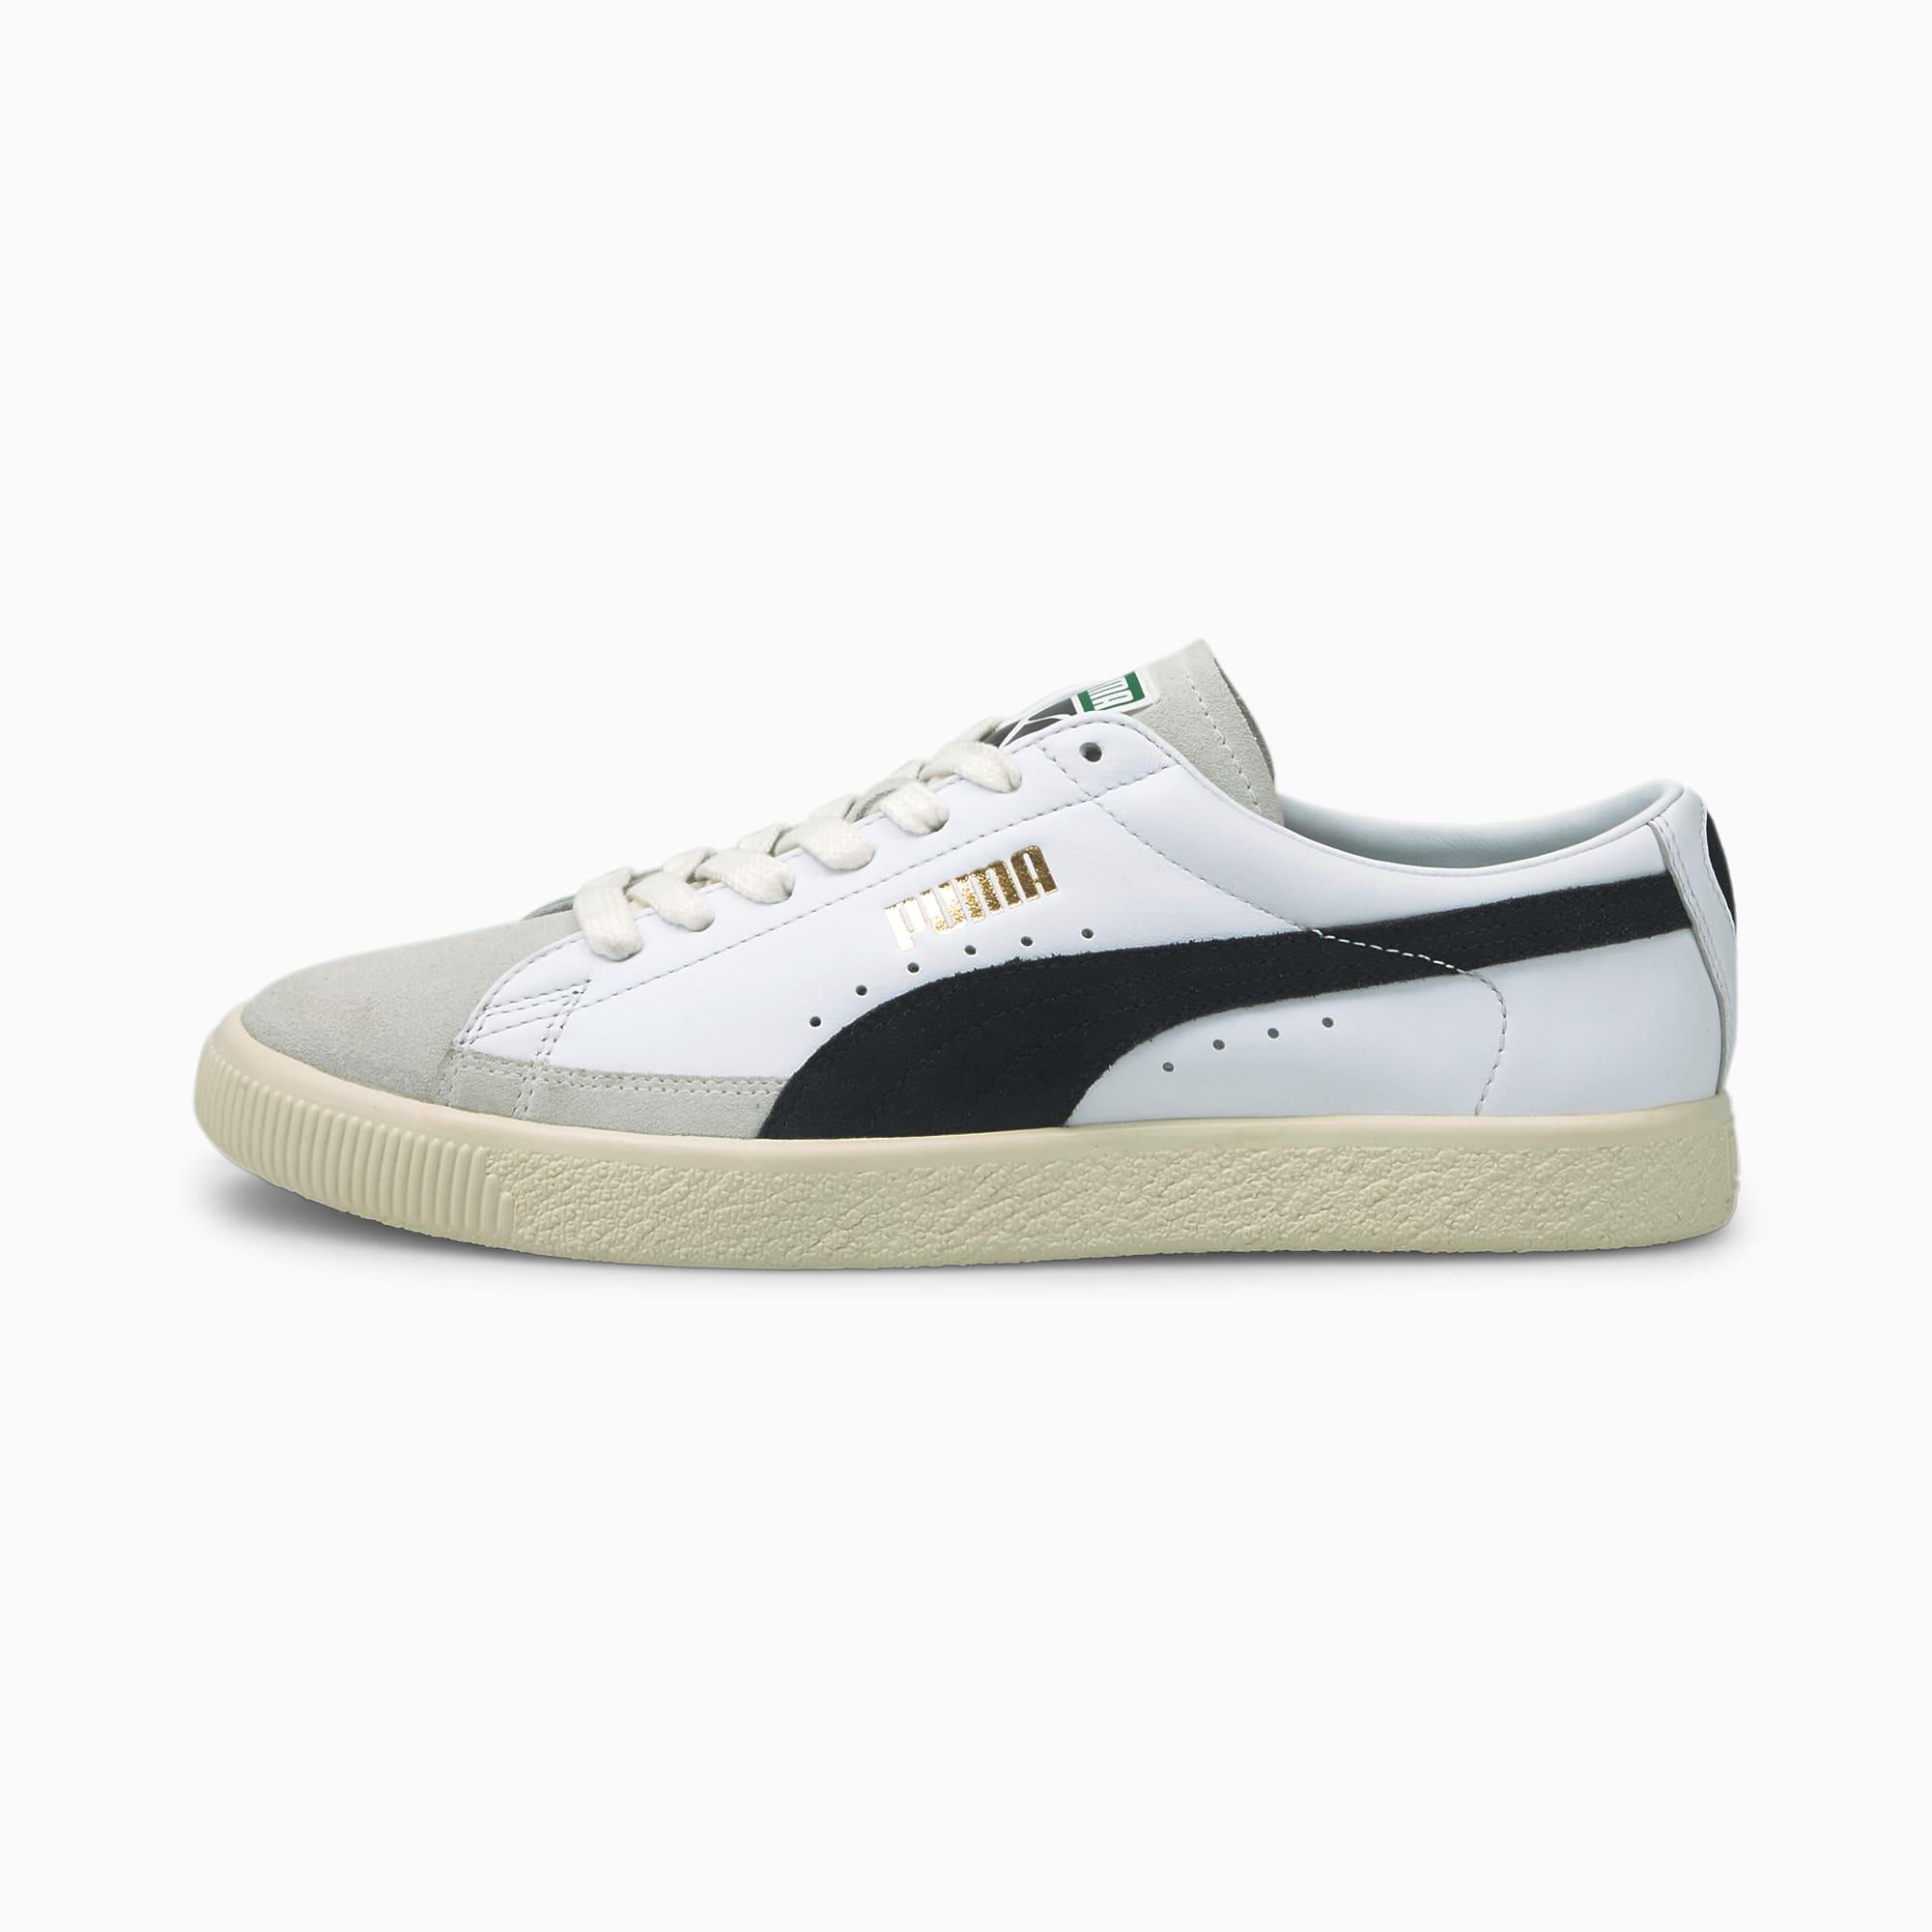 Chaussure Baskets Basket VTG, Blanc/Noir, Taille 40, Chaussures - PUMA - Modalova